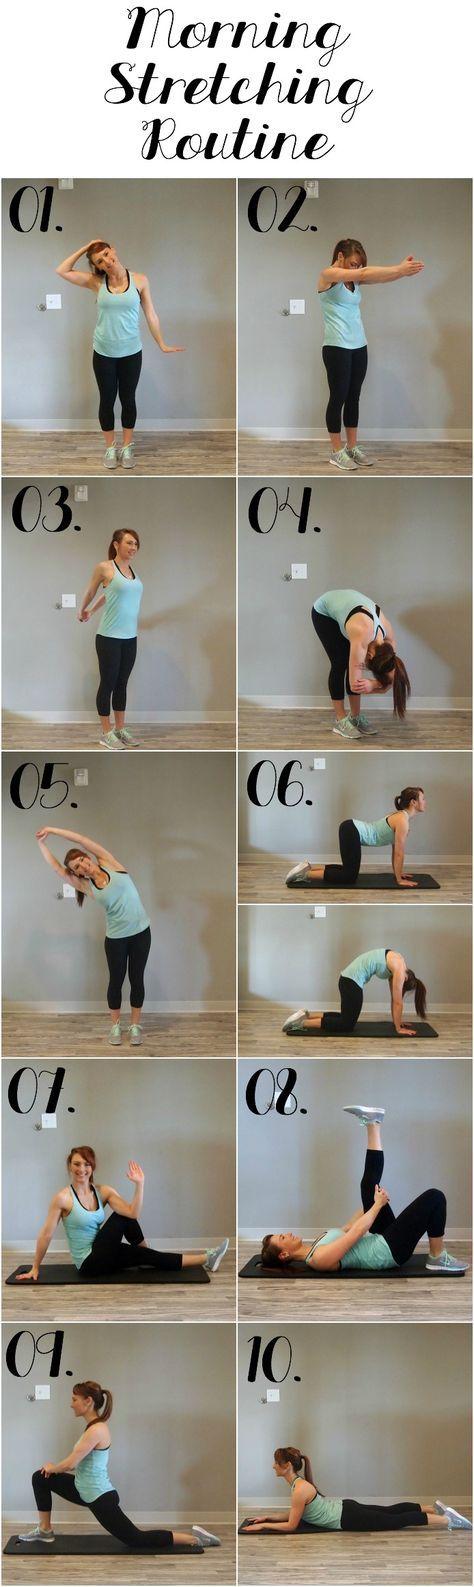 Energizing morning #stretching routine / #Rutina de #estiramientos